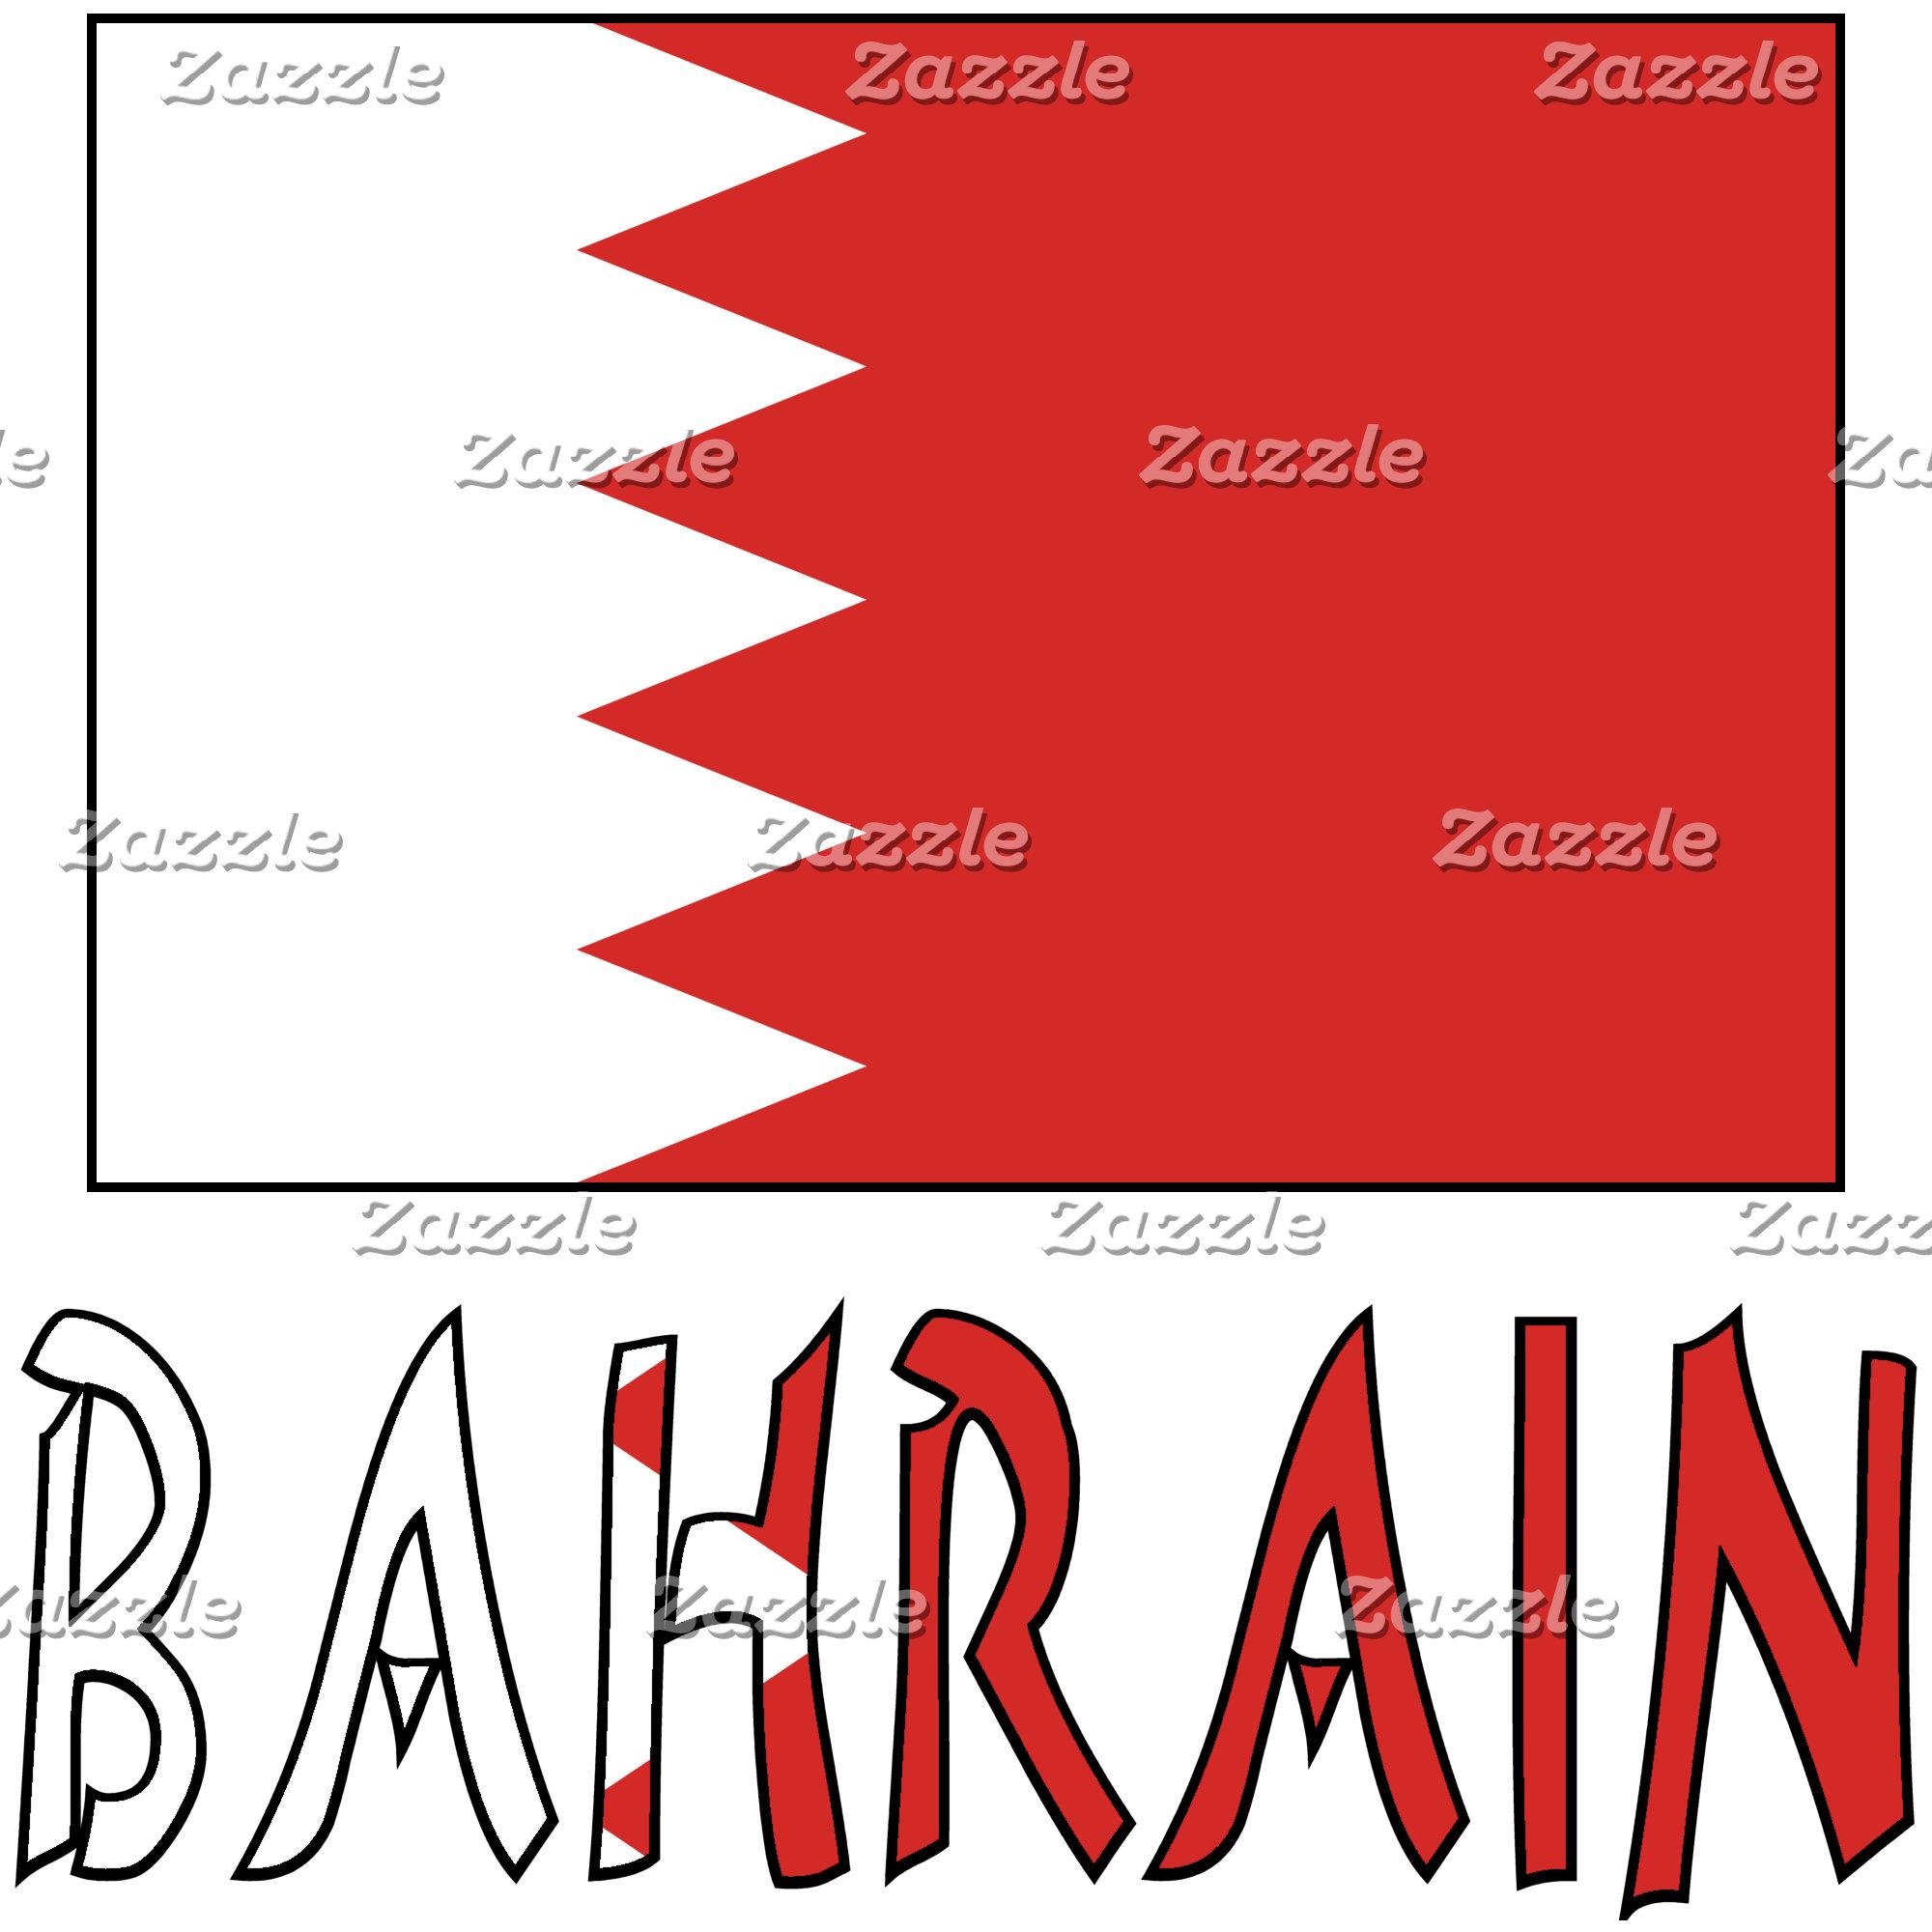 Bahraini Flag and Bahrain